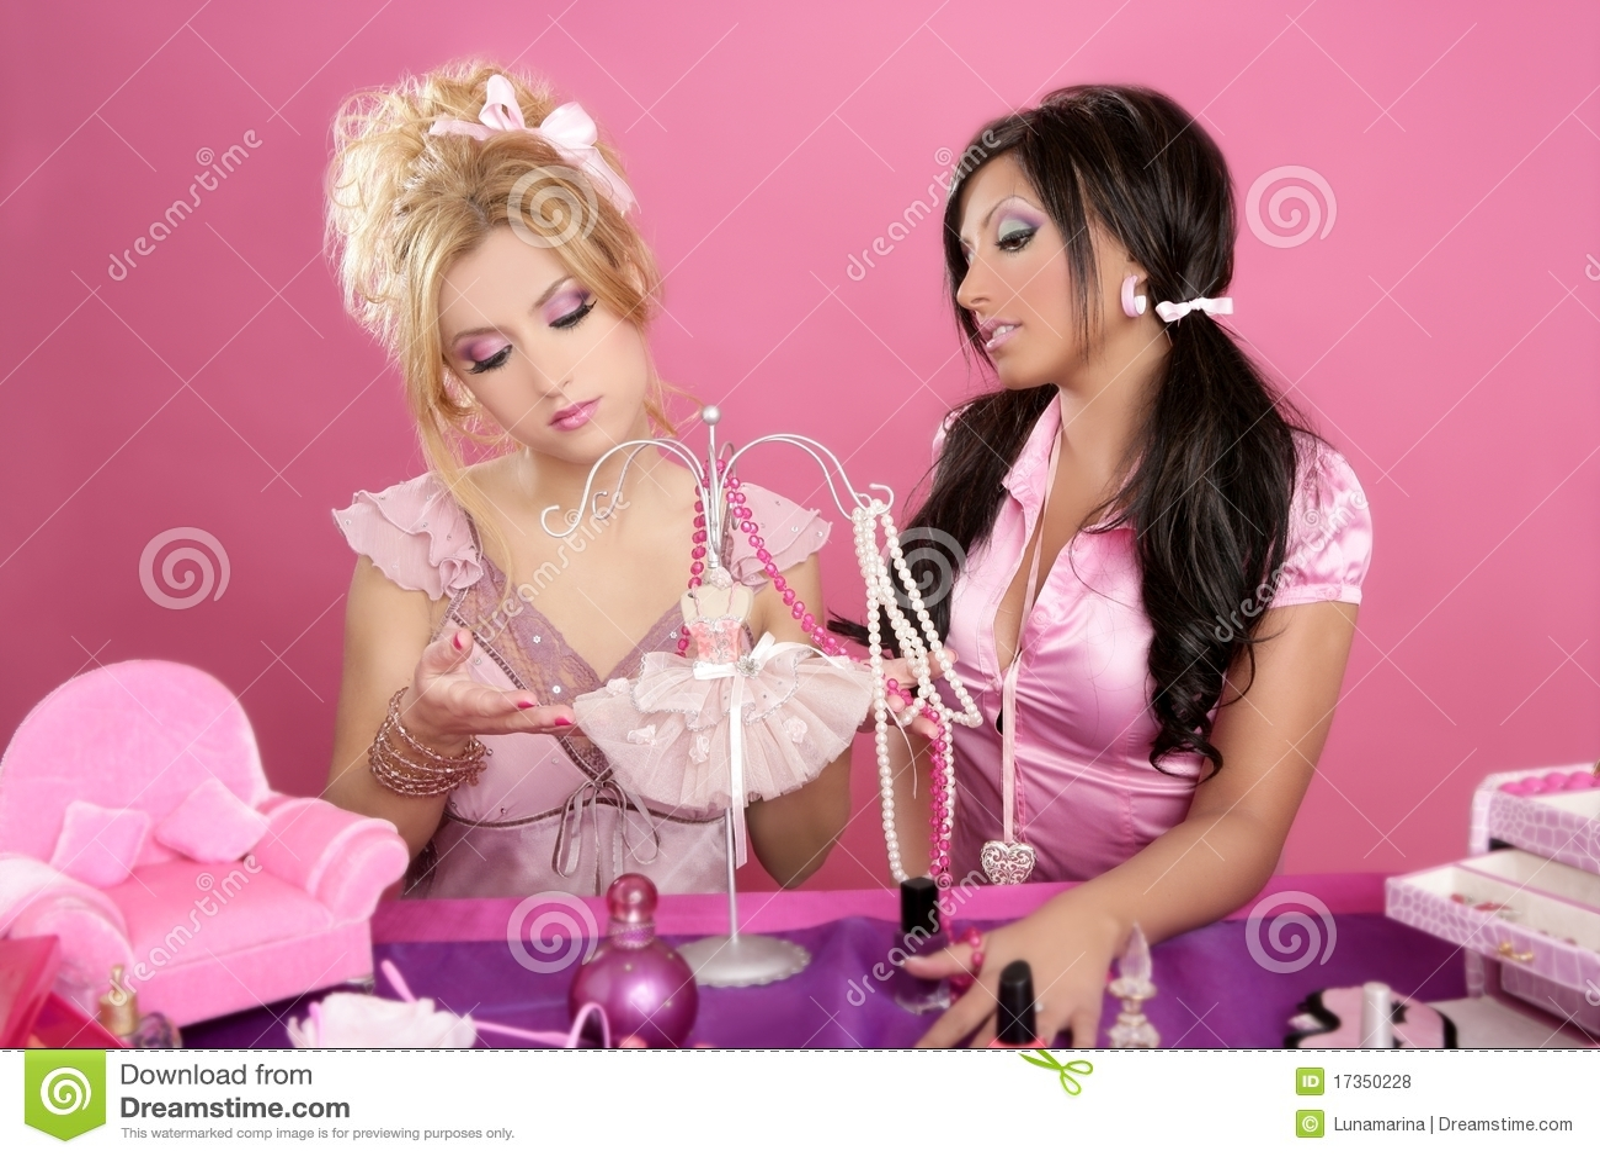 Barbie Doll Girls Pink Vanity Designer Stock Photo Image Of Costume People 17350228